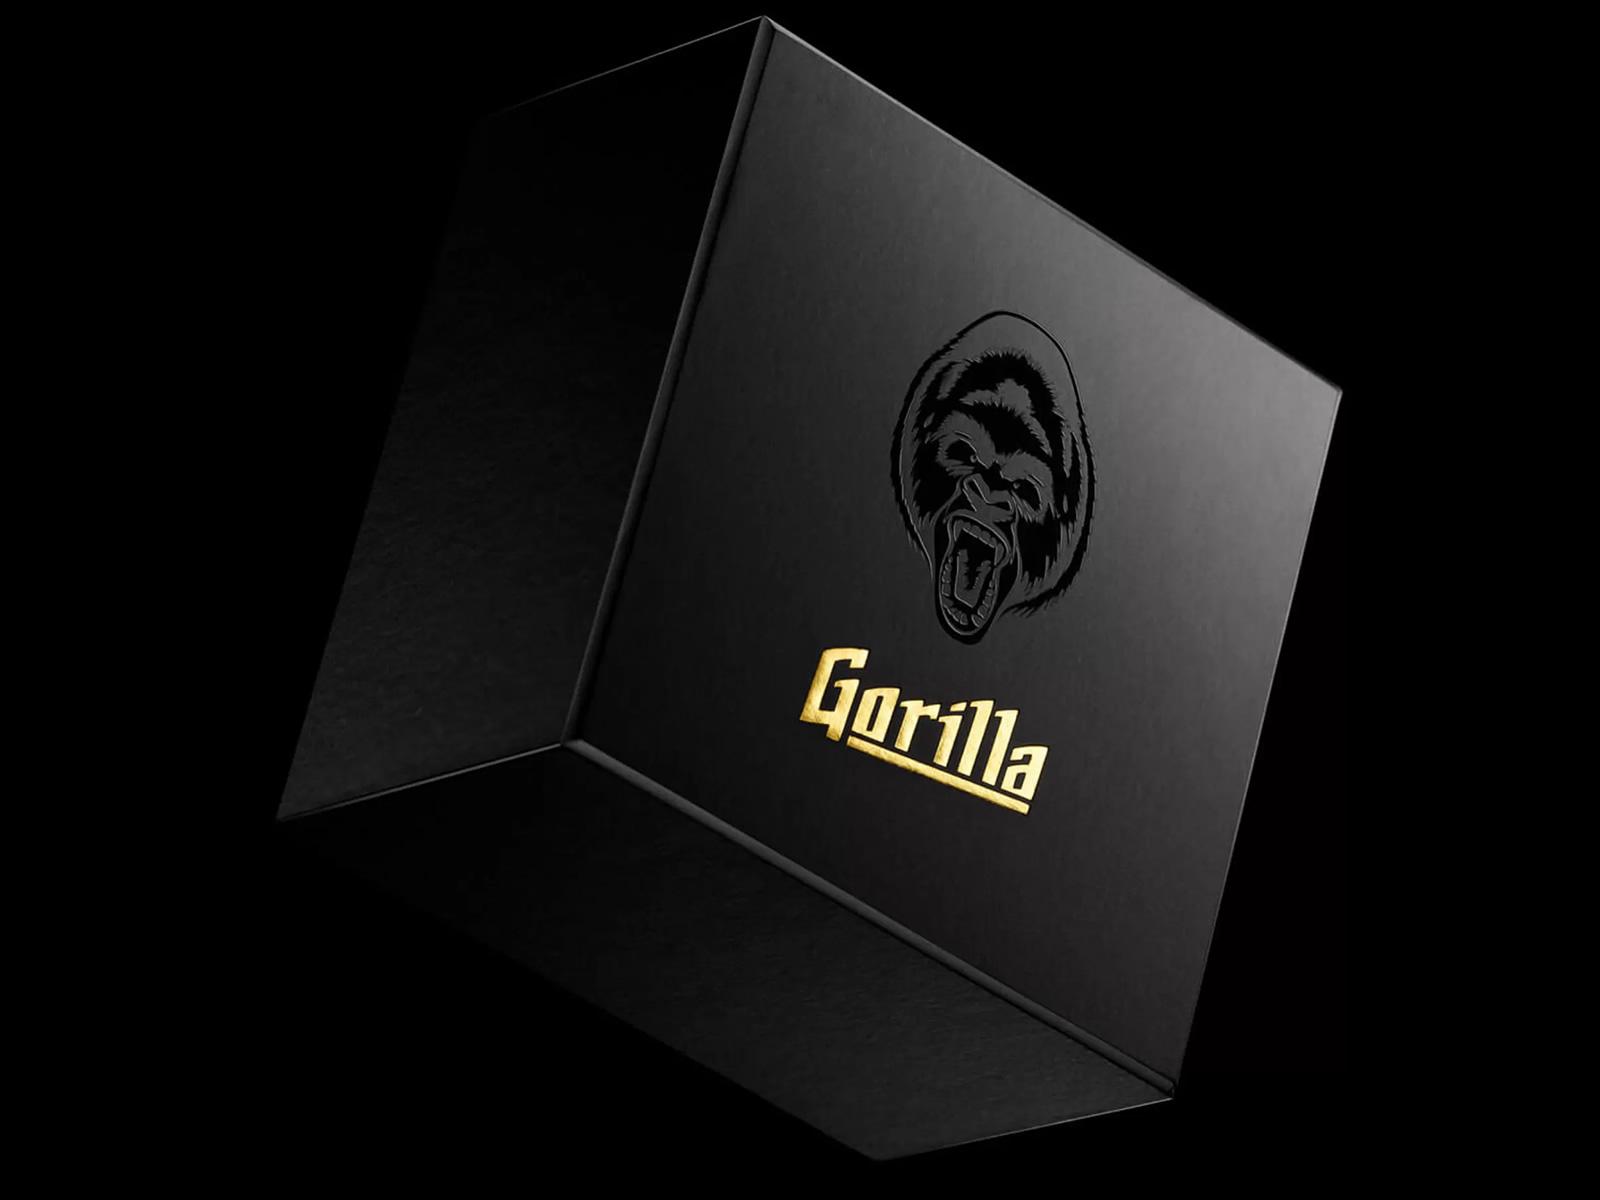 gorilla-fastback-gt-drift-14-.jpg